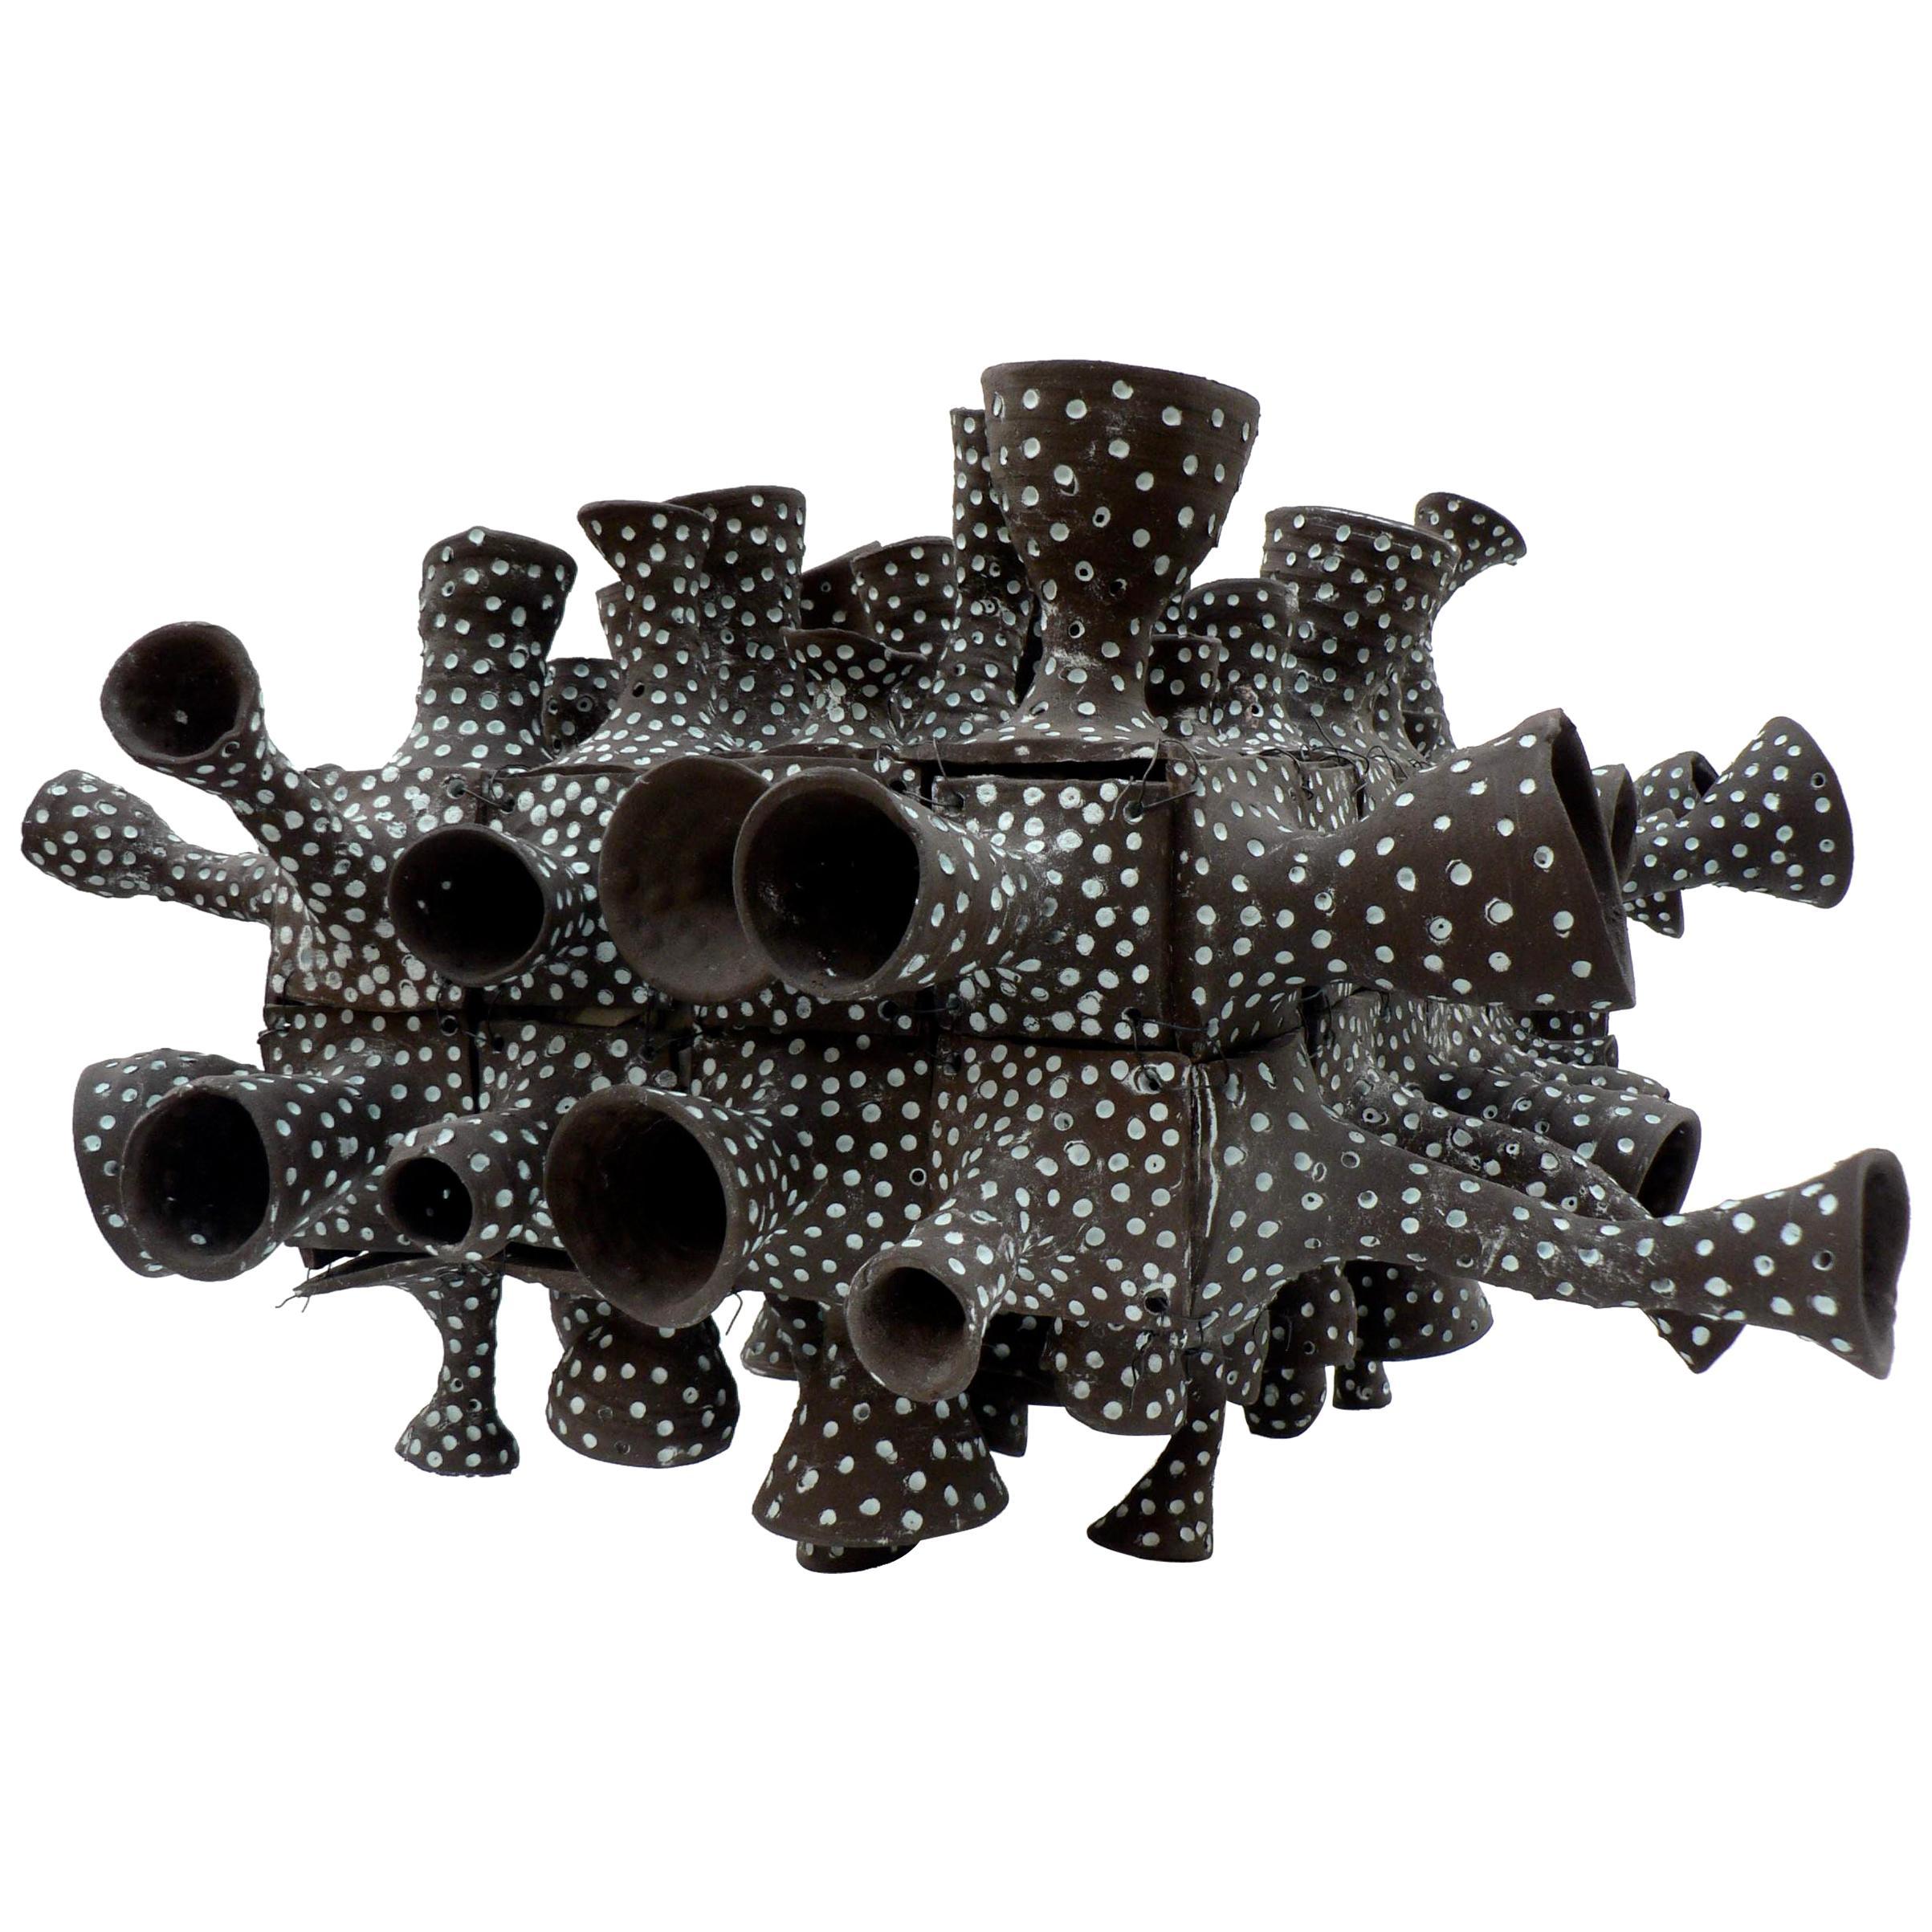 "21st Century Porcelain Sculpture ""Peeping Tom"" by Ursula Commandeur Black Clay"